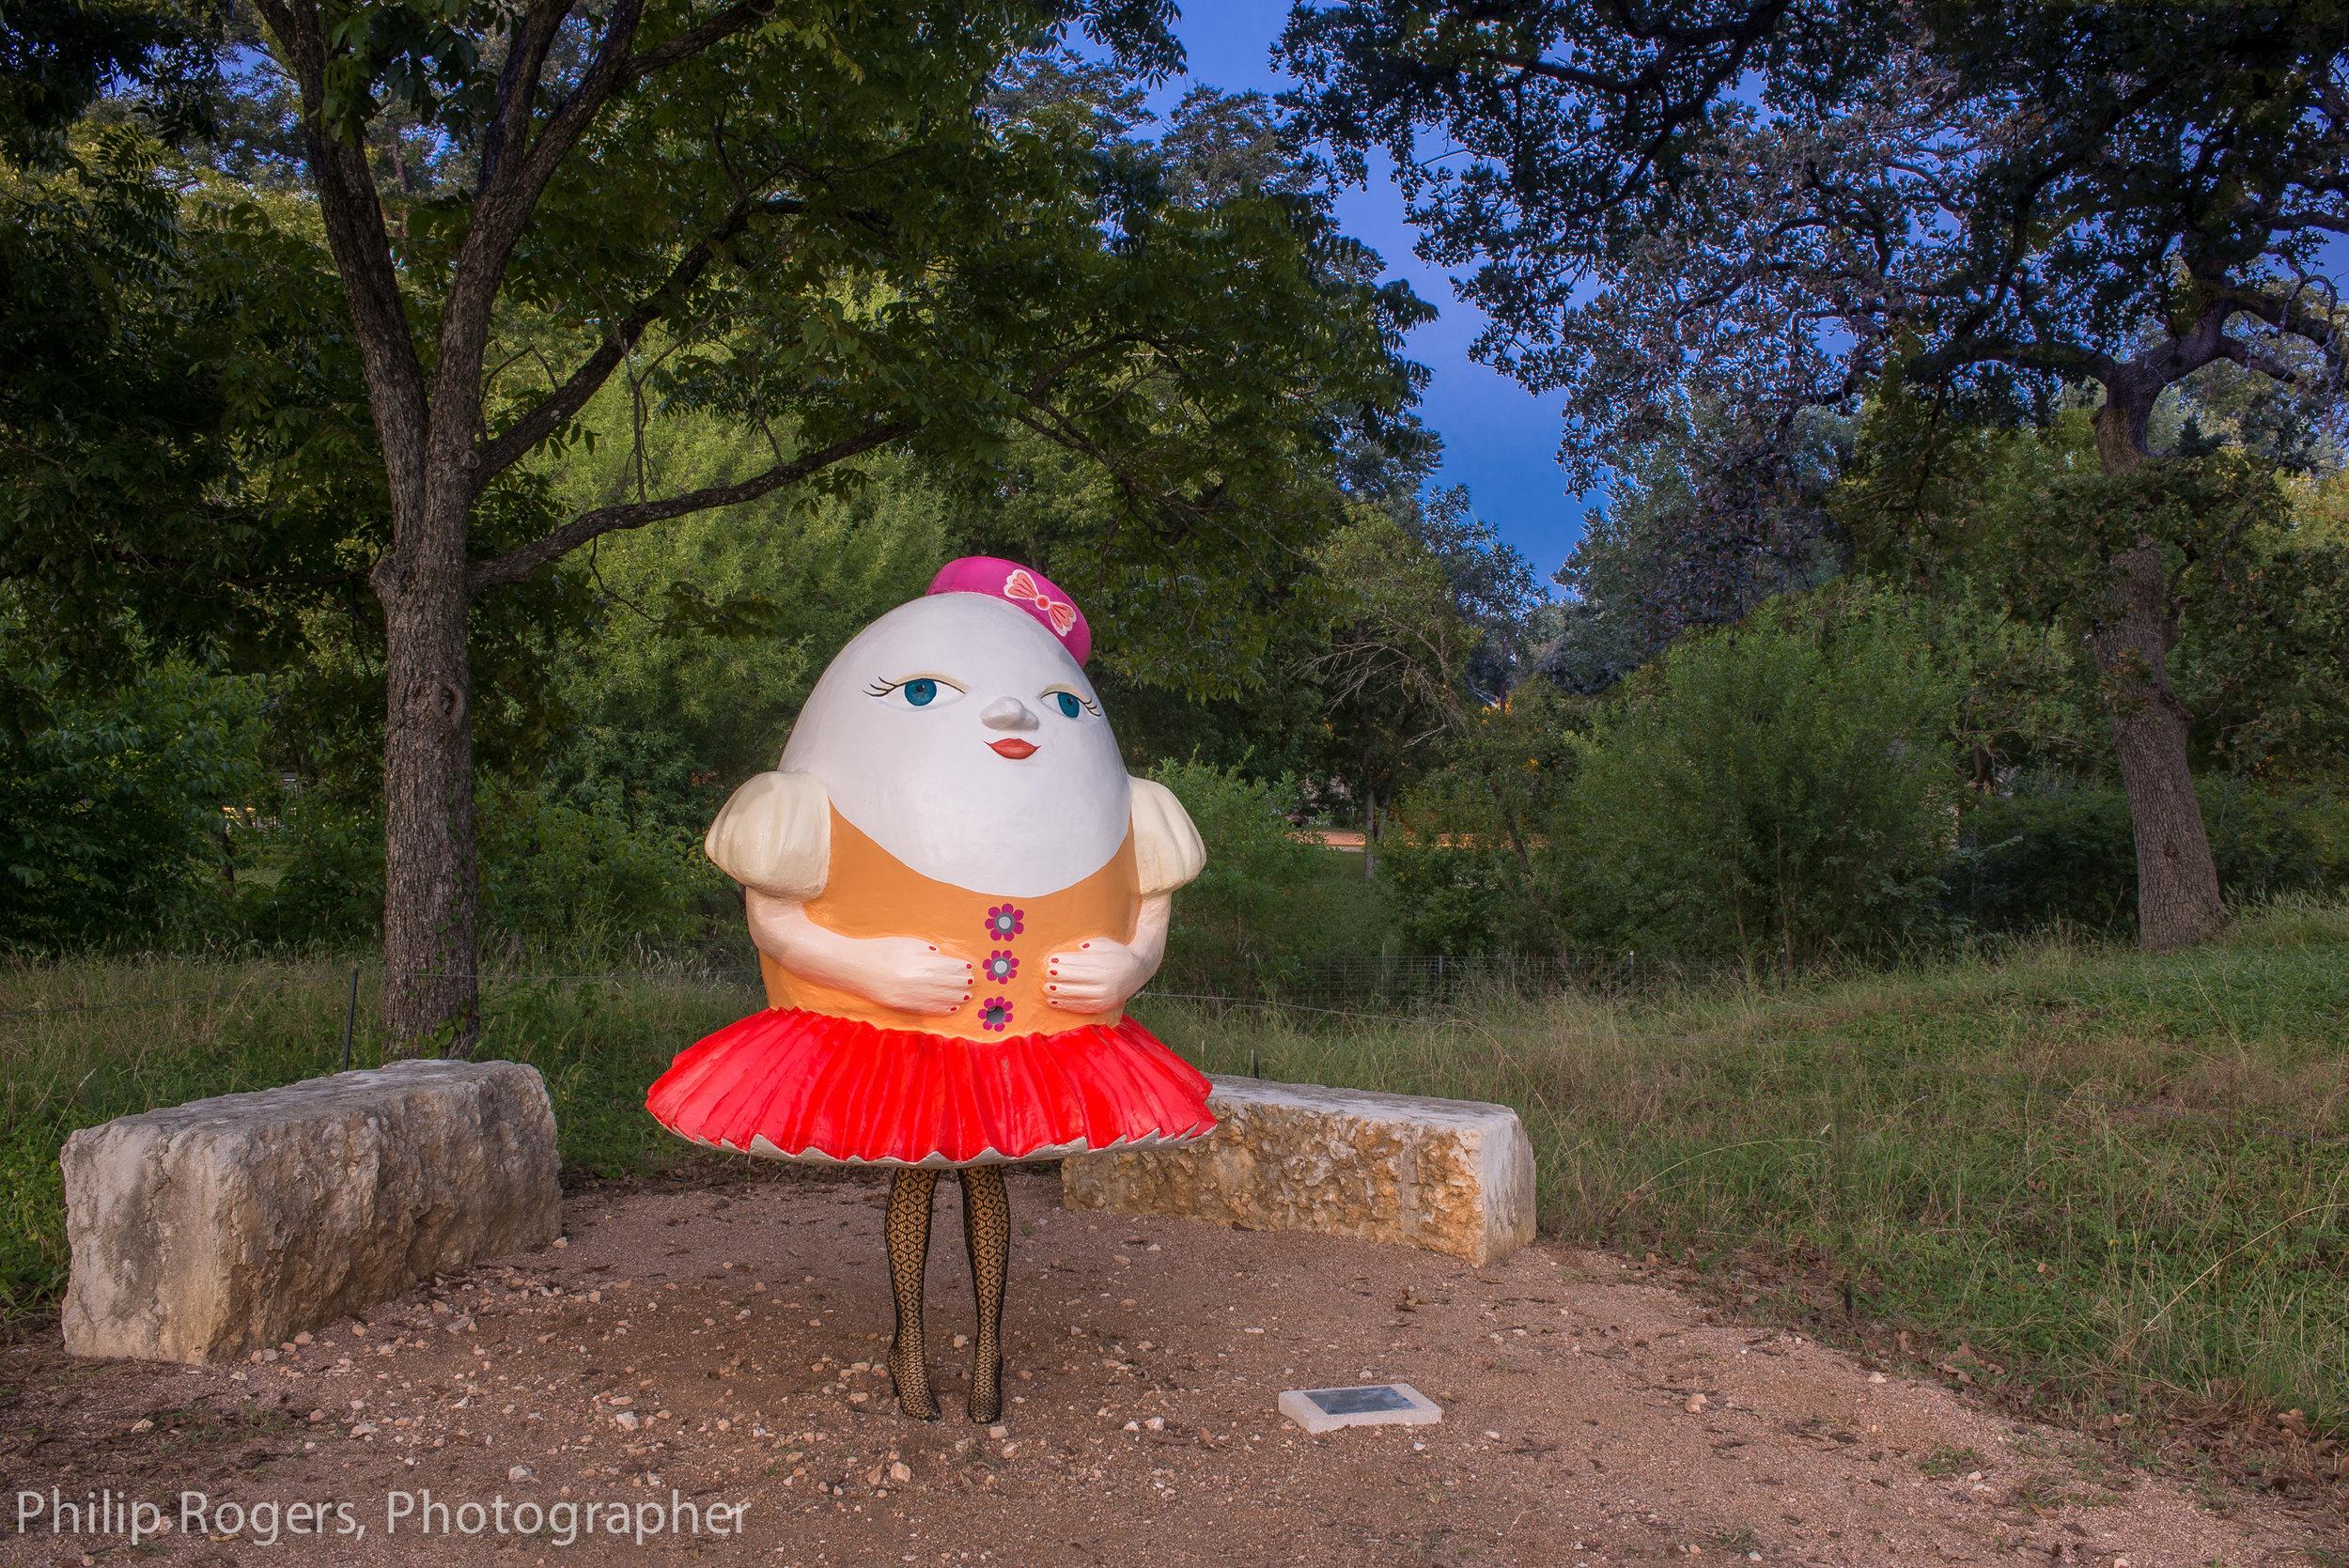 Mrs Humpty Dumpty Philip Rogers Photo-15.jpg